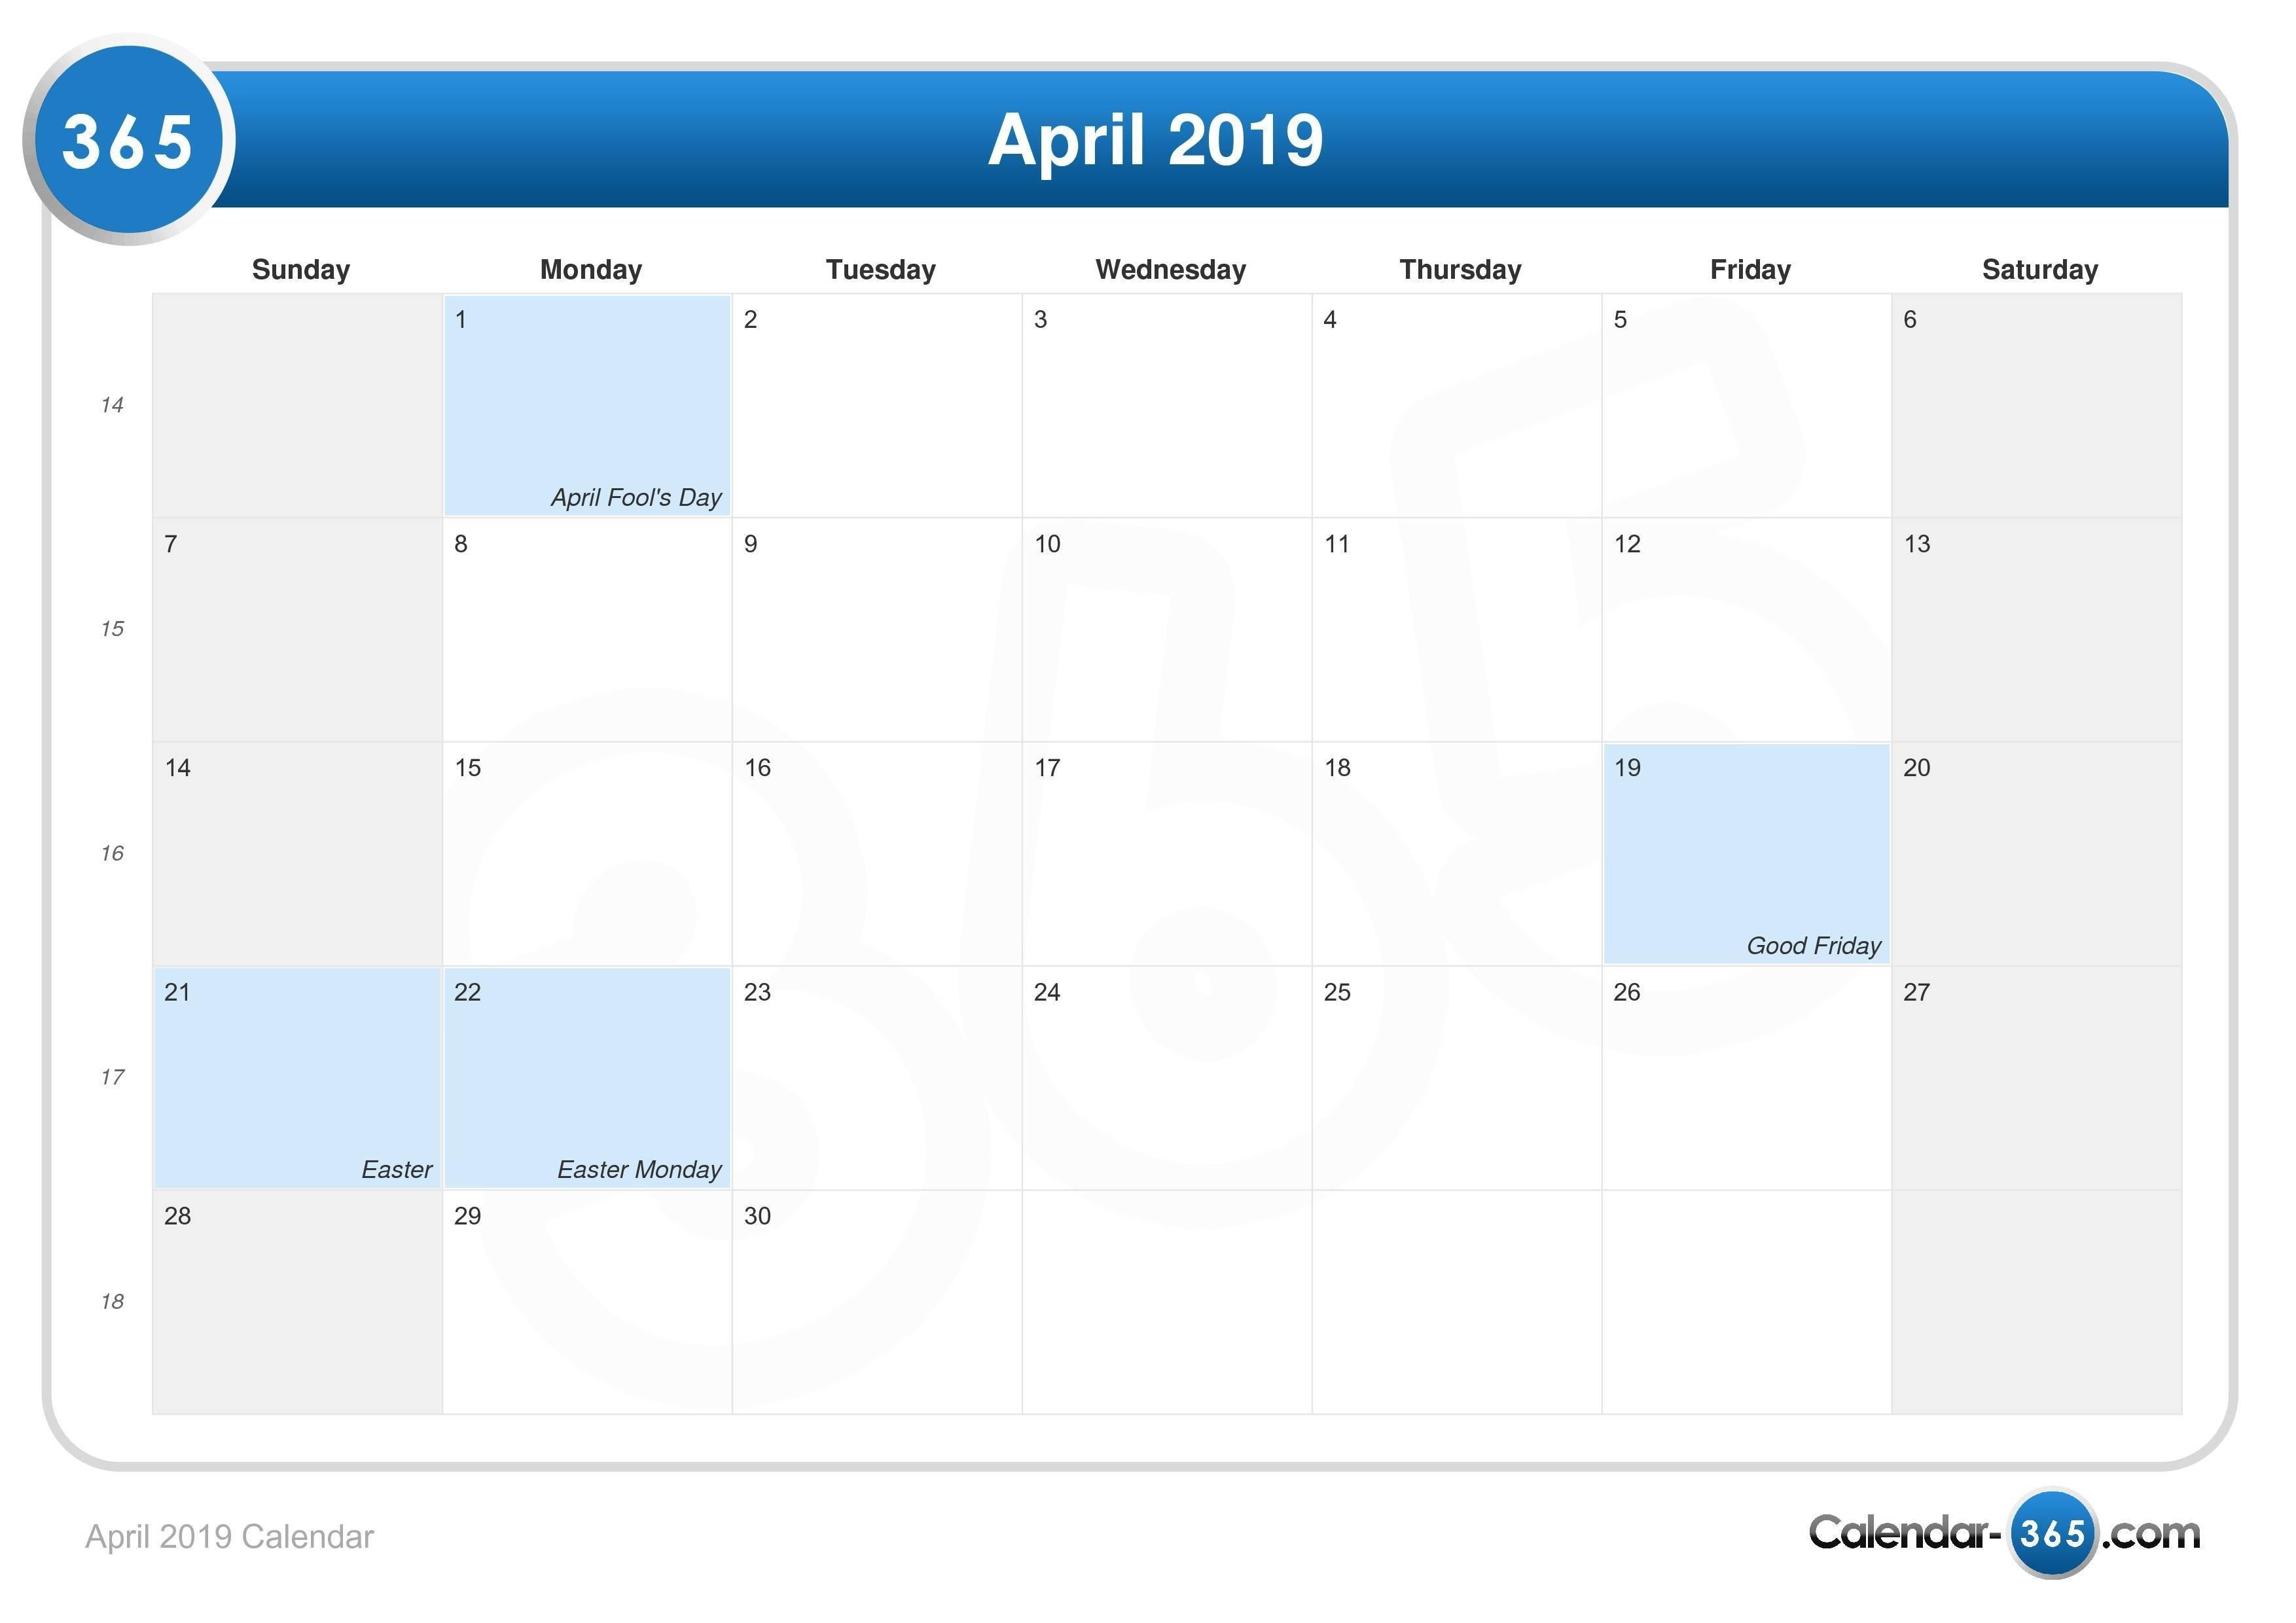 April 2019 Calendar April 3 2019 Calendar